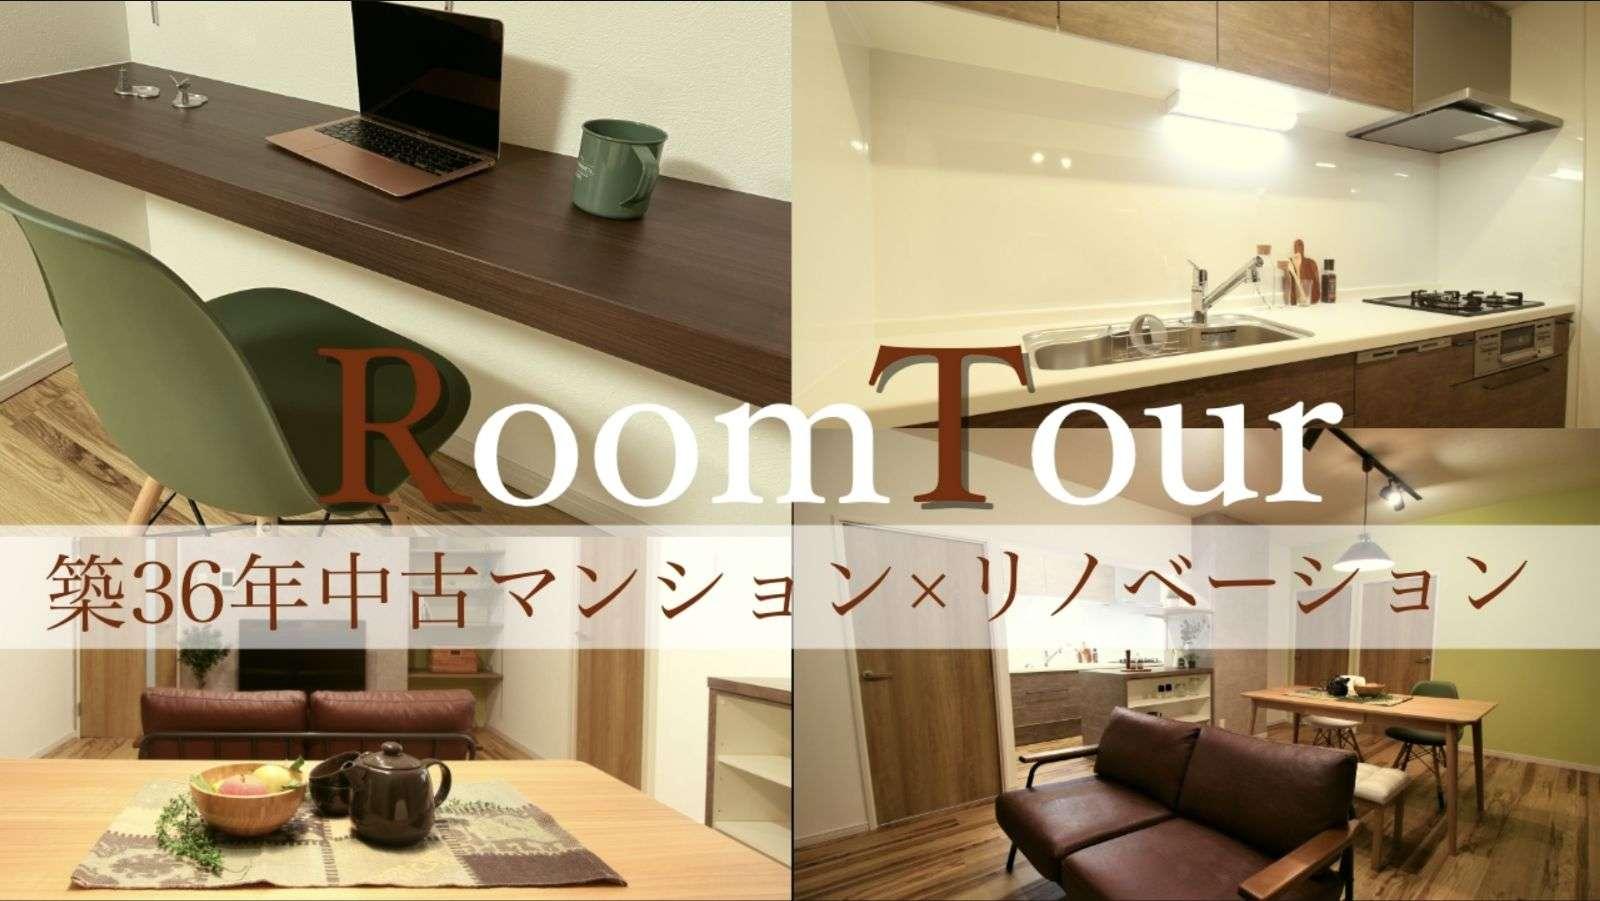 YouTube動画UPしました【Room Tour】 名古屋市名東区猪高台